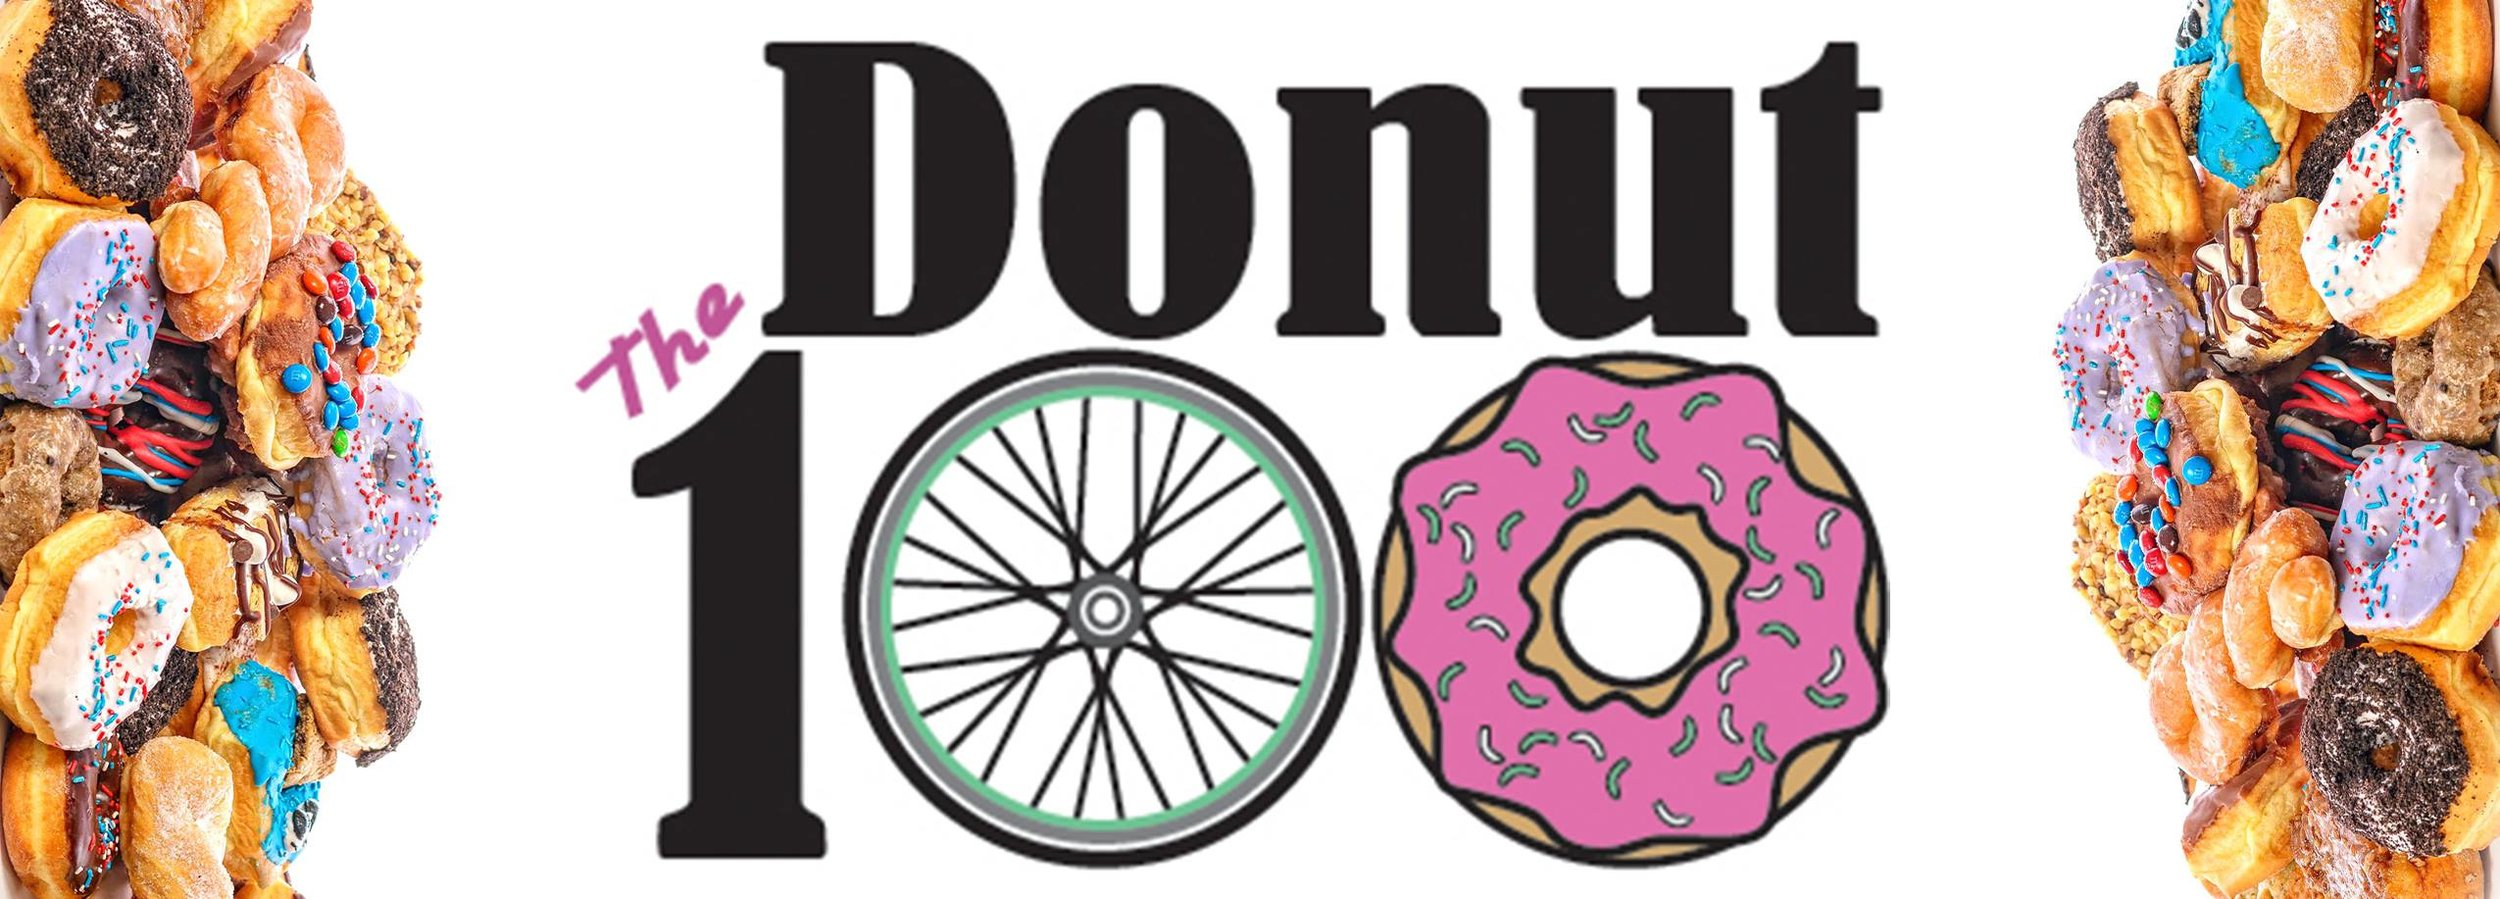 donut logo.jpg